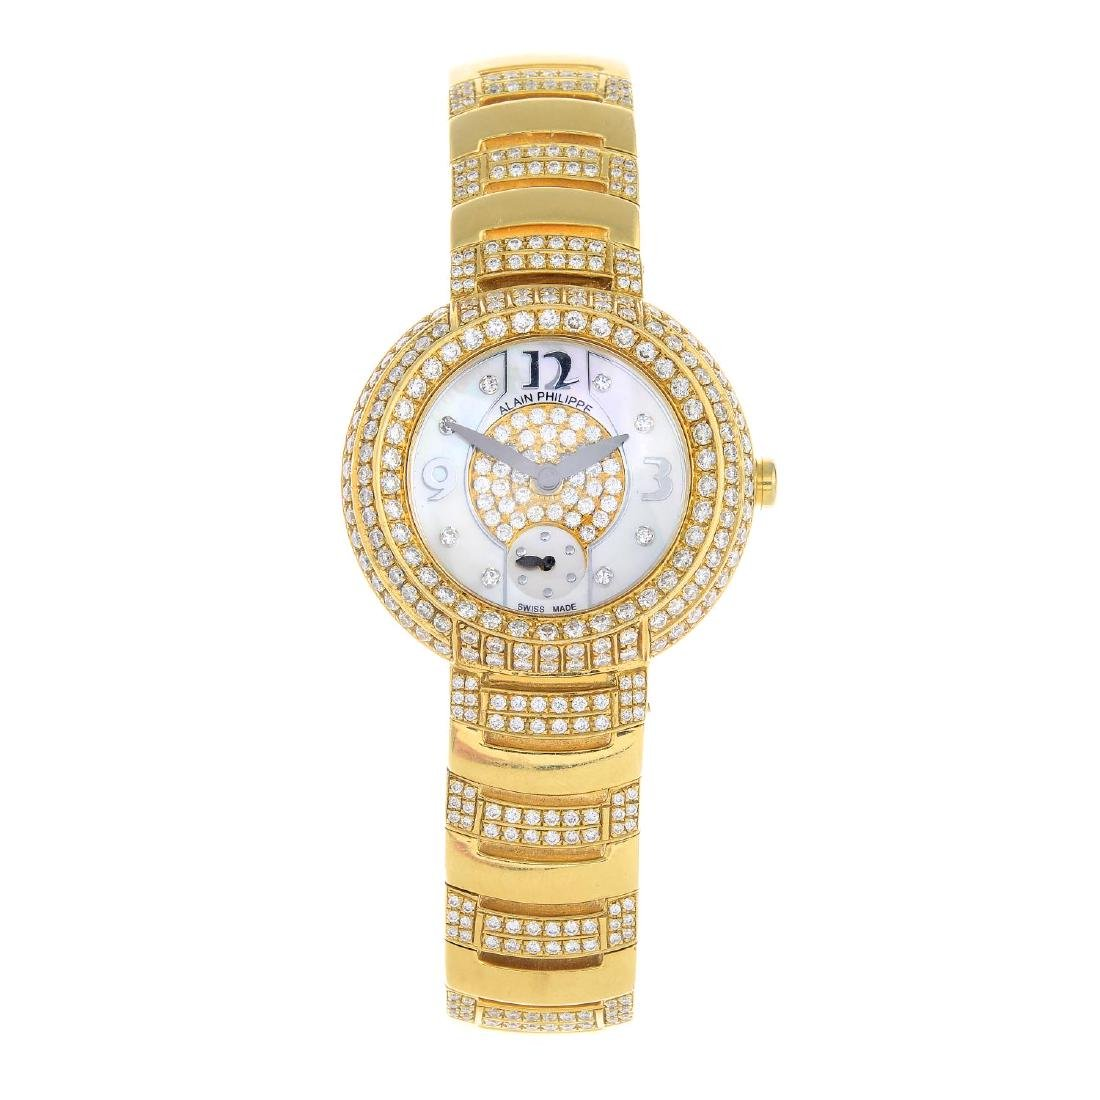 ALAIN PHILIPPE - an 18ct gold diamond wrist watch. The